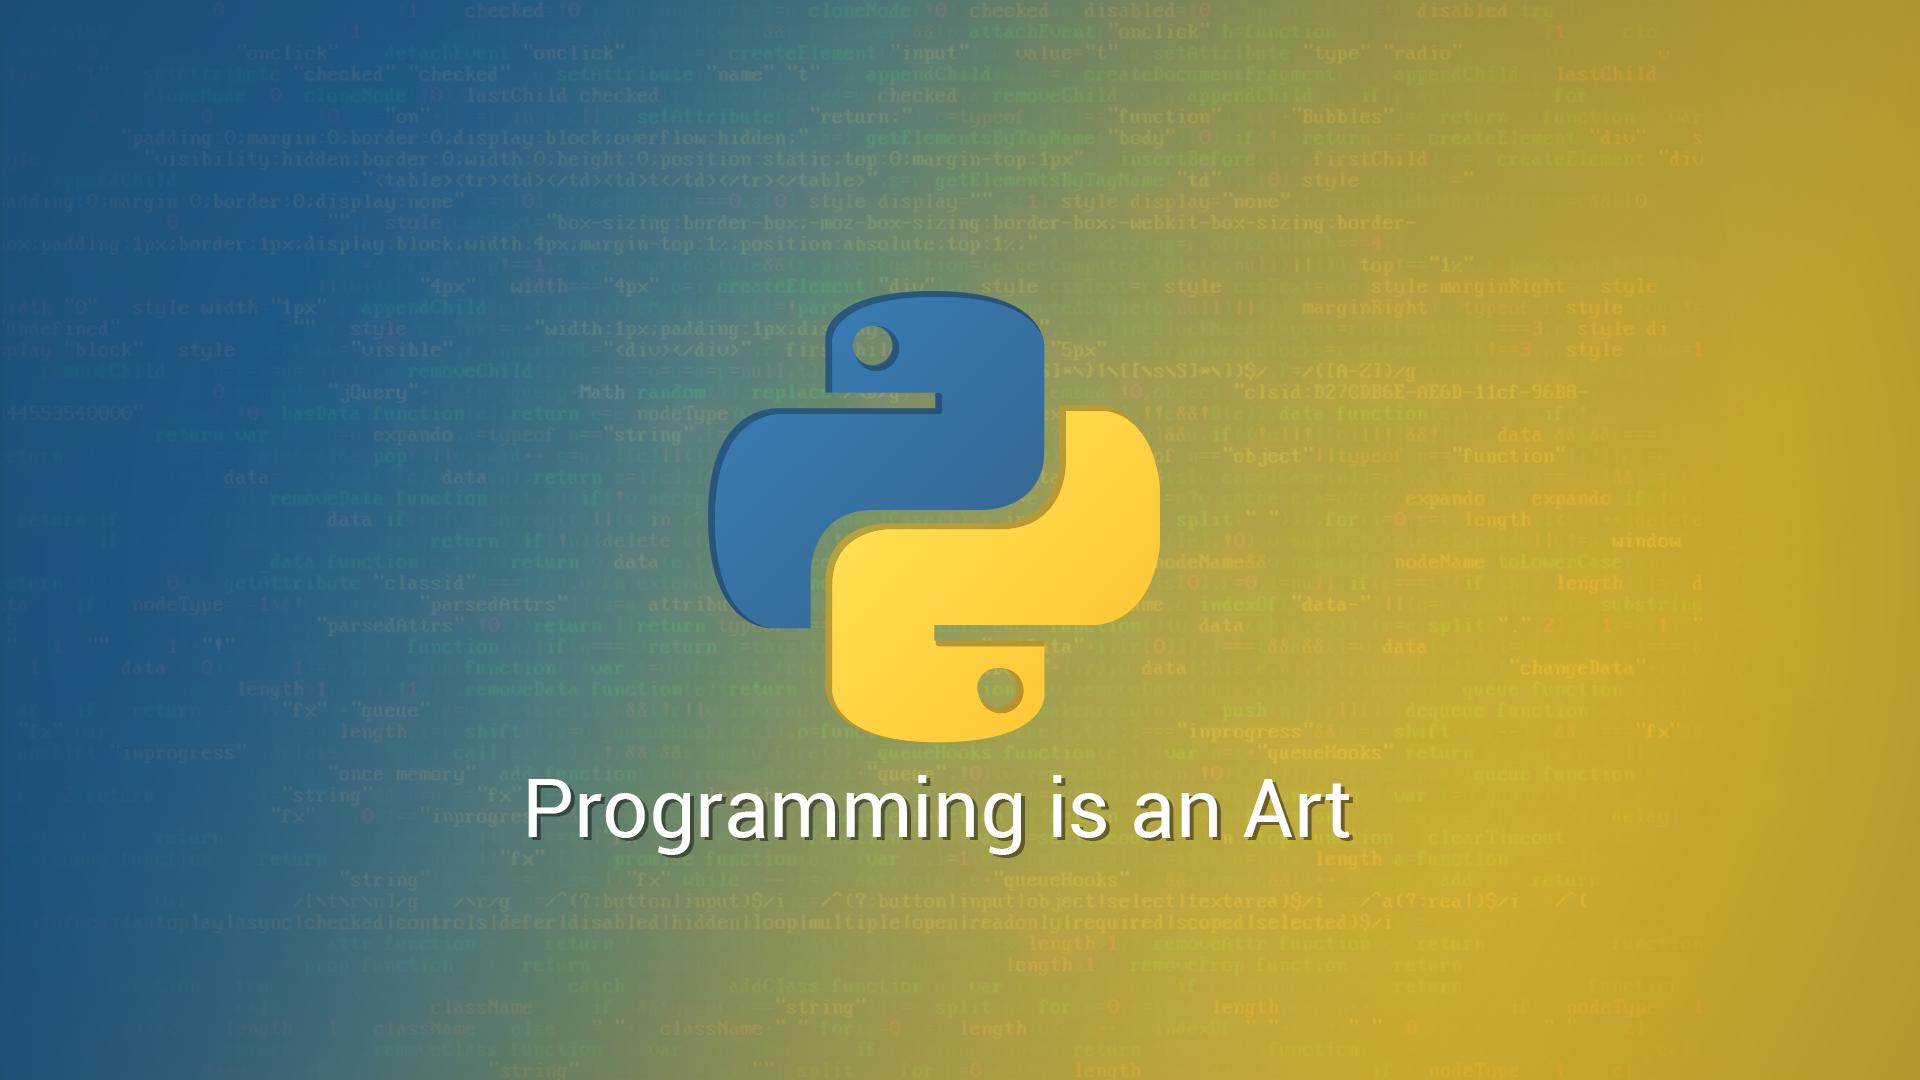 Illustration Text Logo Code Computer Circle Programming Language Brand Python Number Screenshot Wallpaper